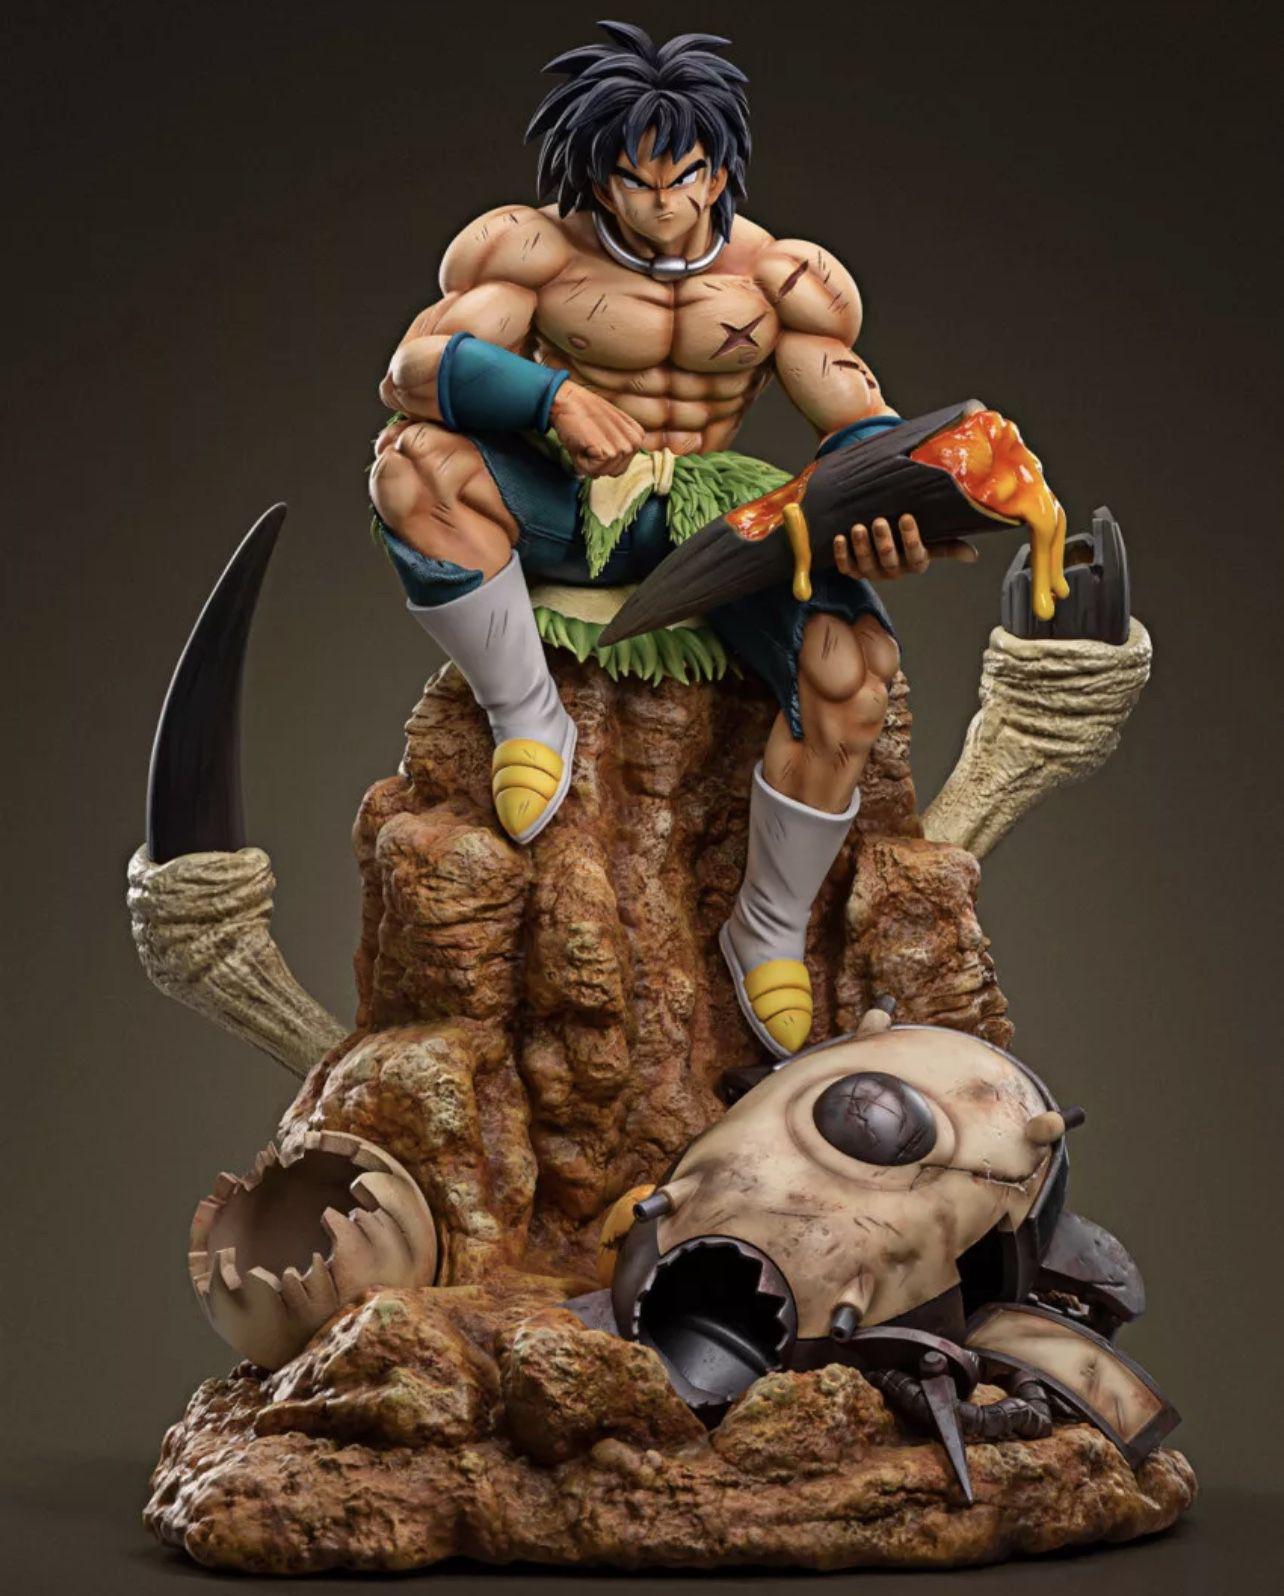 Anime Resin Figures!! Dragonball Z , Attack On Titan